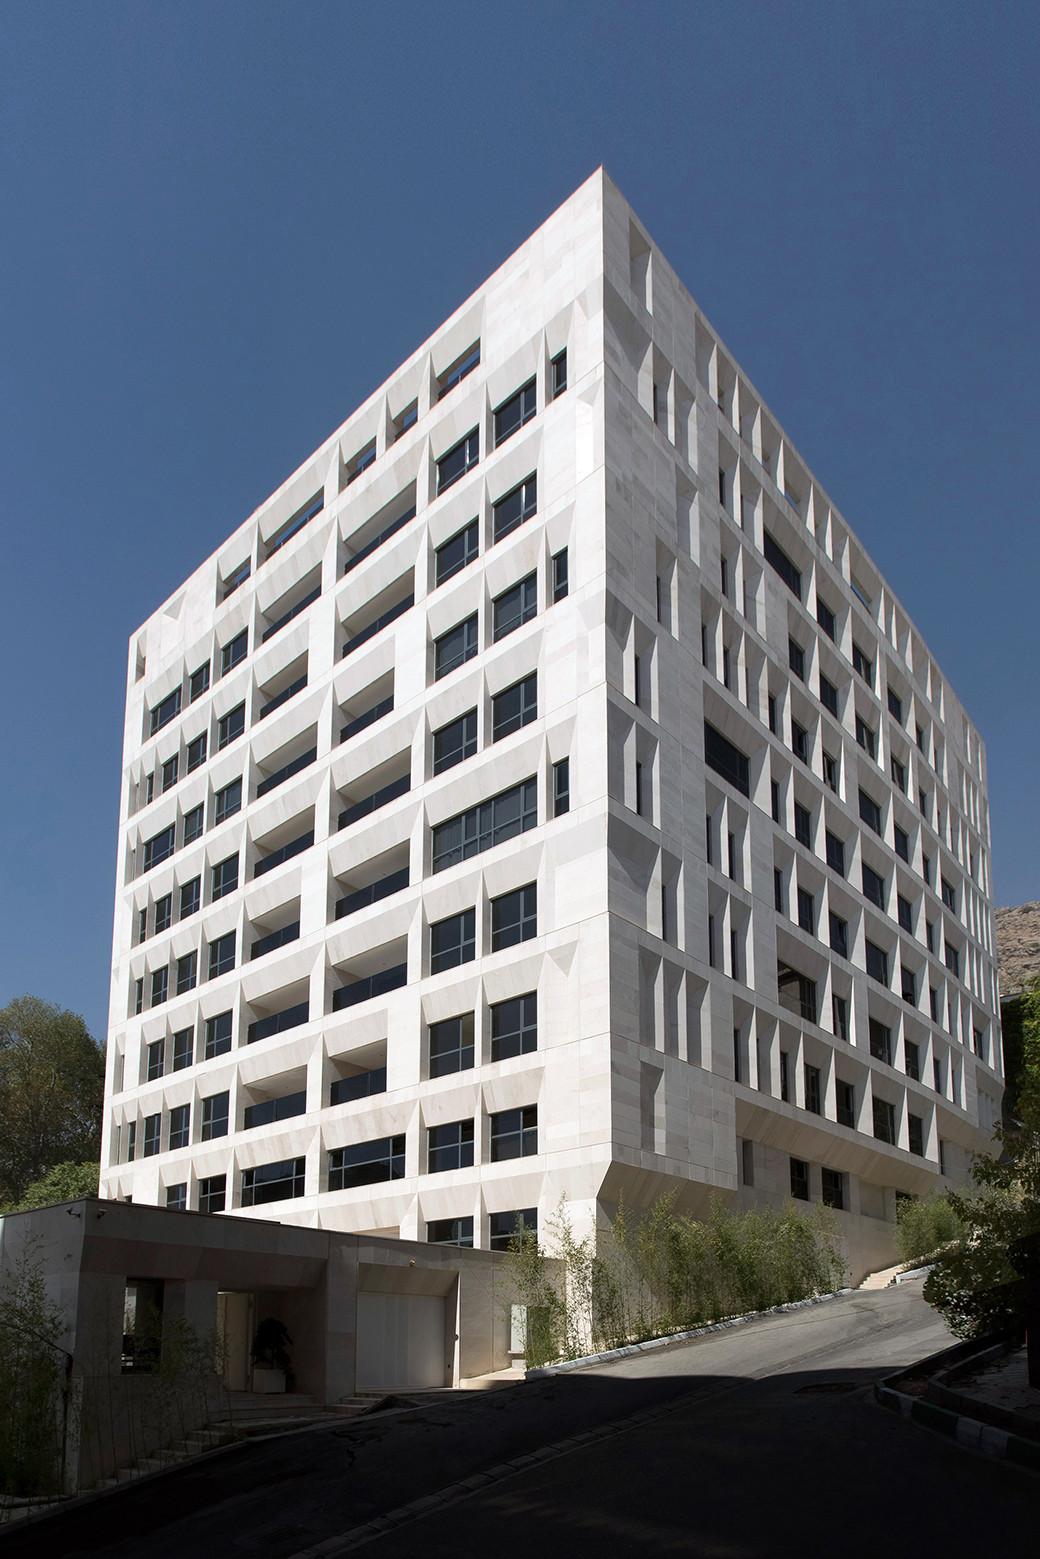 Gallery of sipan residential building ryra studio 10 for Residential house builders